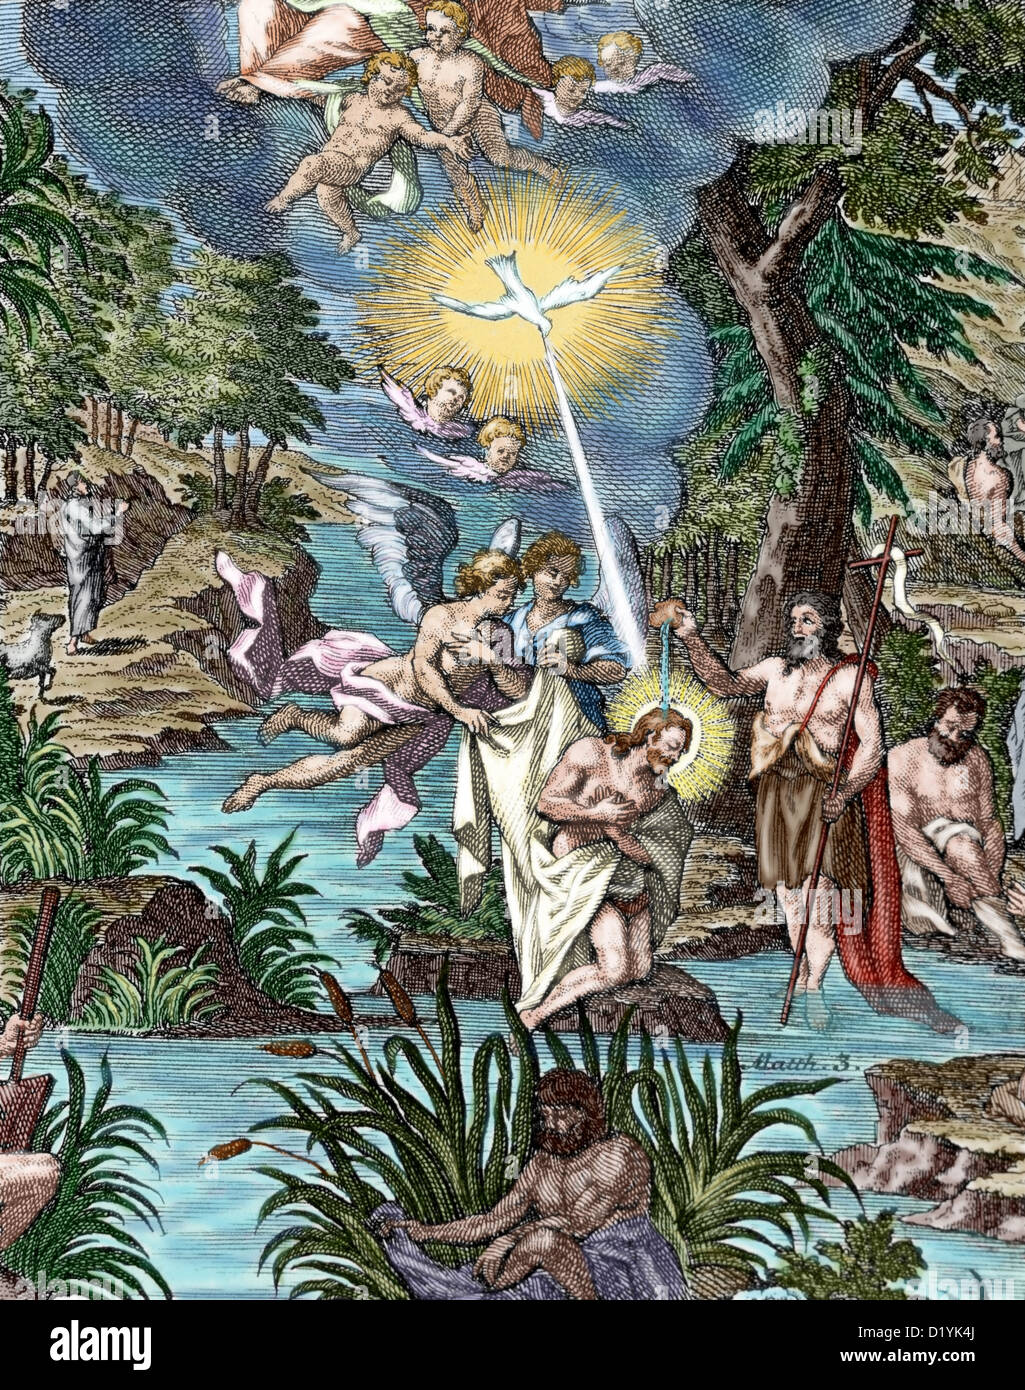 Matthew 3. John the Baptist baptizing Jesus. Colored engraving. - Stock Image